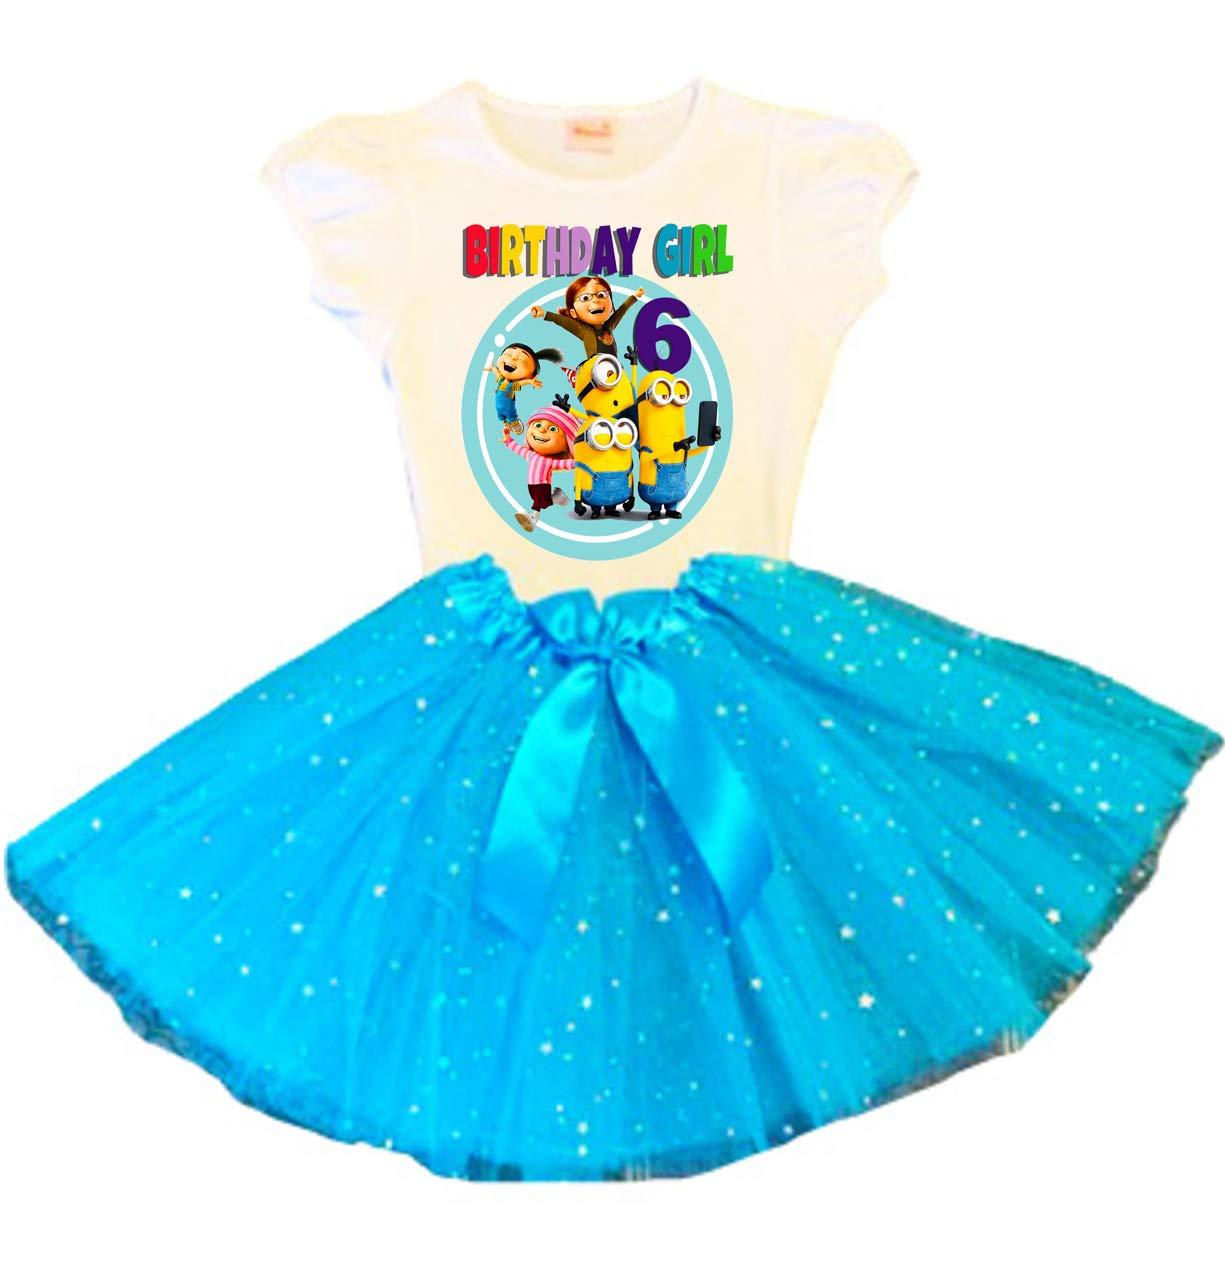 Minions Birthday Portland Mall Tutu 6th Ou Turquoise Dress Party Bargain